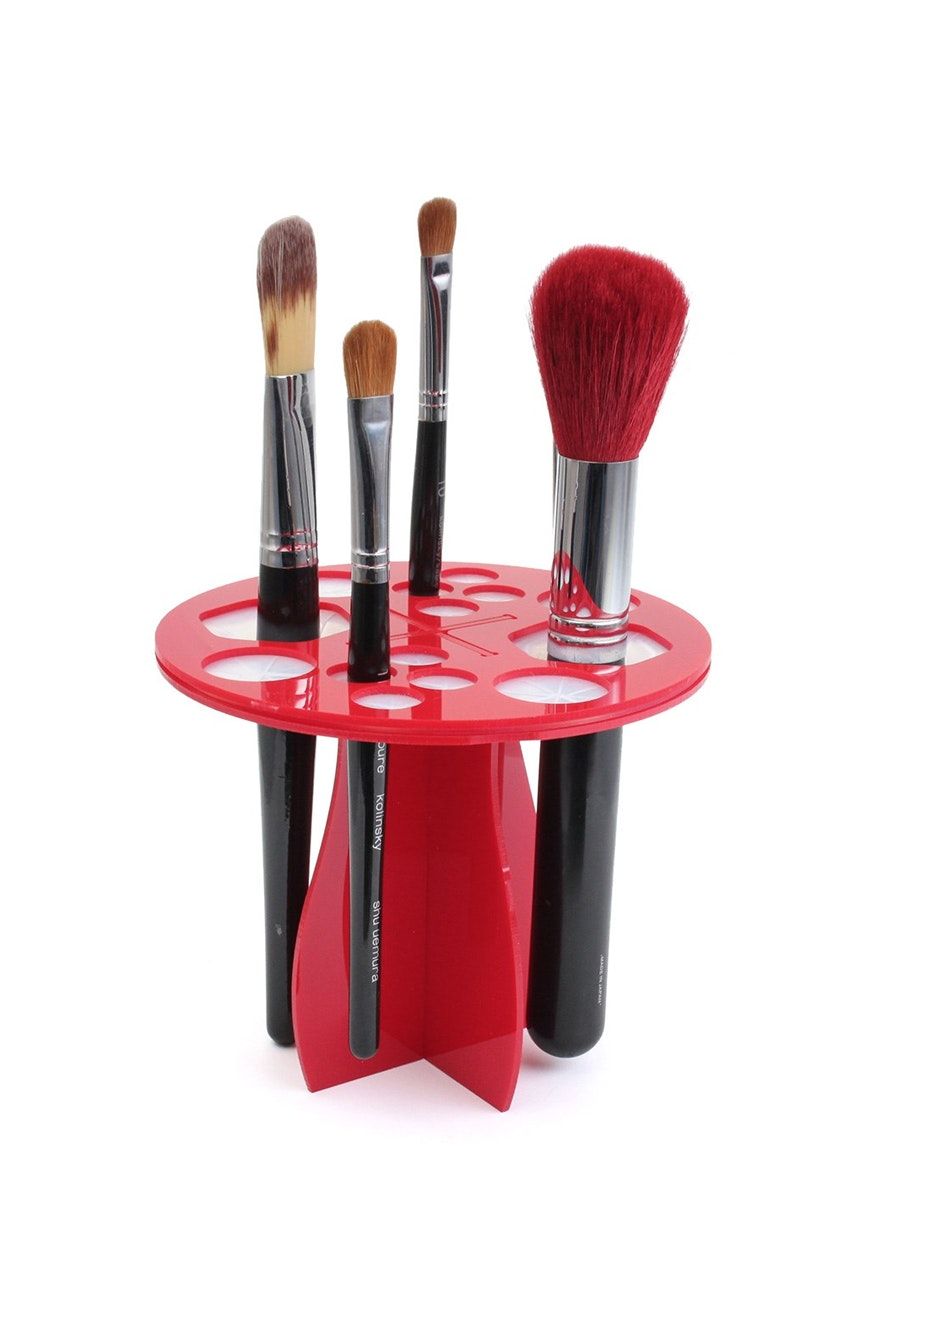 Makeup Brush Rack Storage Holder Stand & Dryer -Red